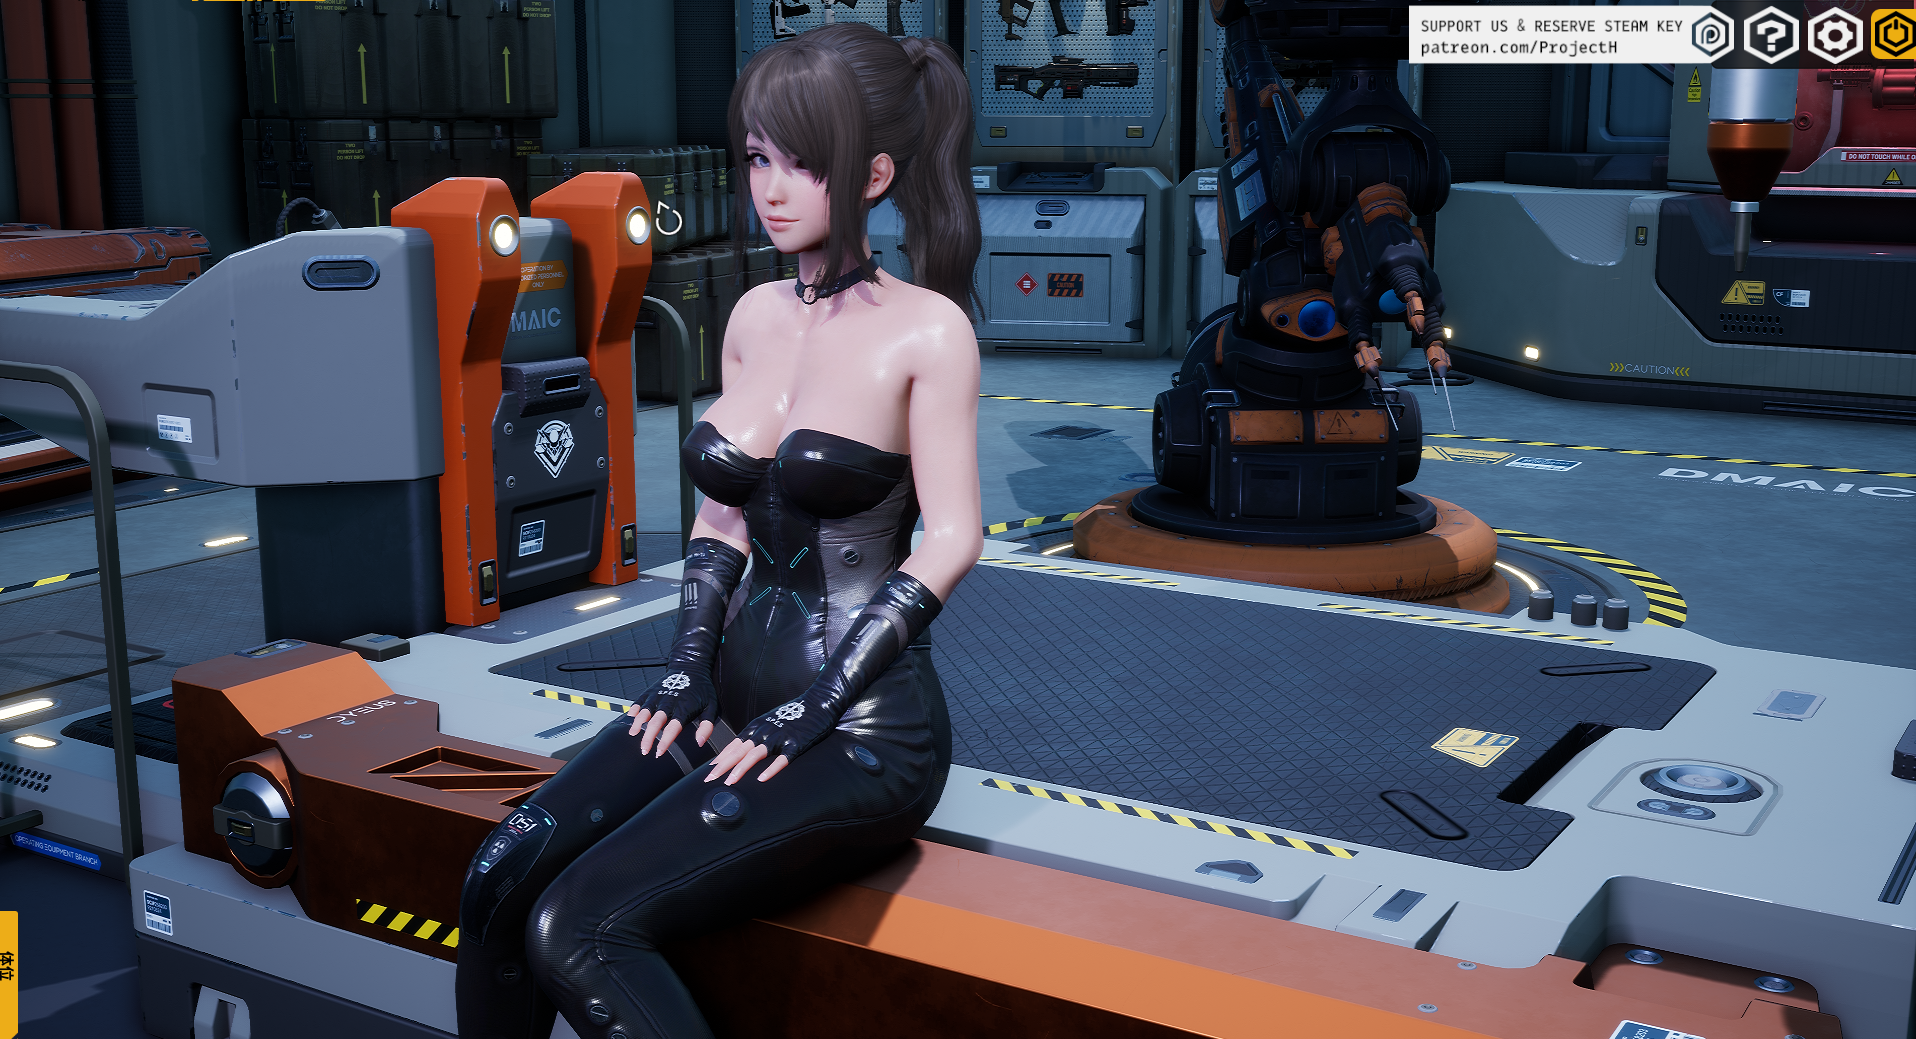 【3D互动/虚幻4】堕落玩偶女1号 Project H Fallen Doll Ver1.31最终版+动画版【16G】